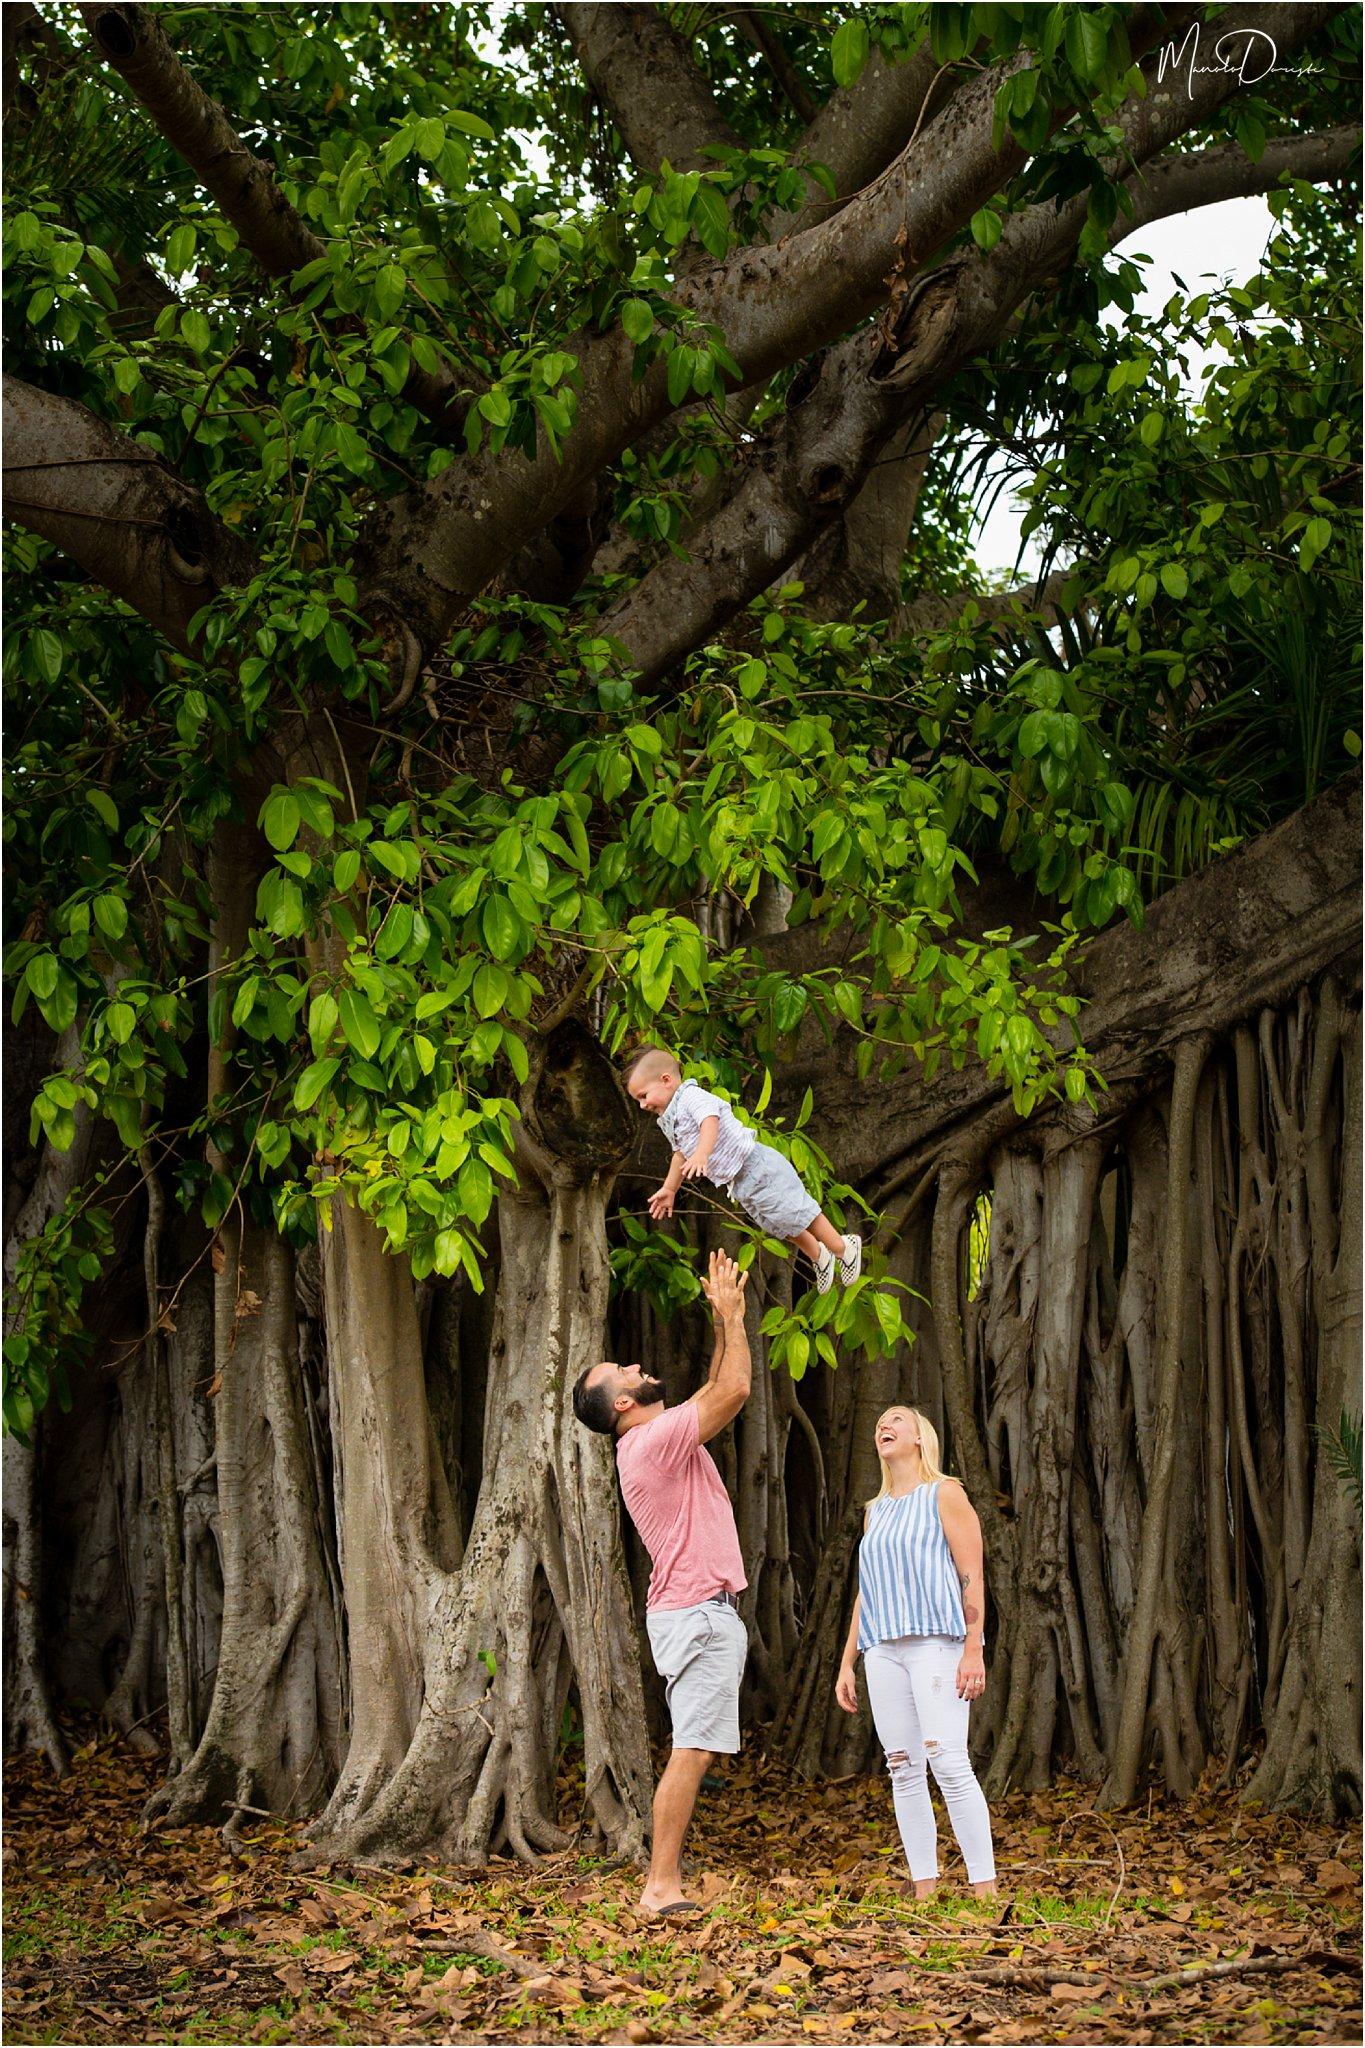 0209_ManoloDoreste_InFocusStudios_Wedding_Family_Photography_Miami_MiamiPhotographer.jpg